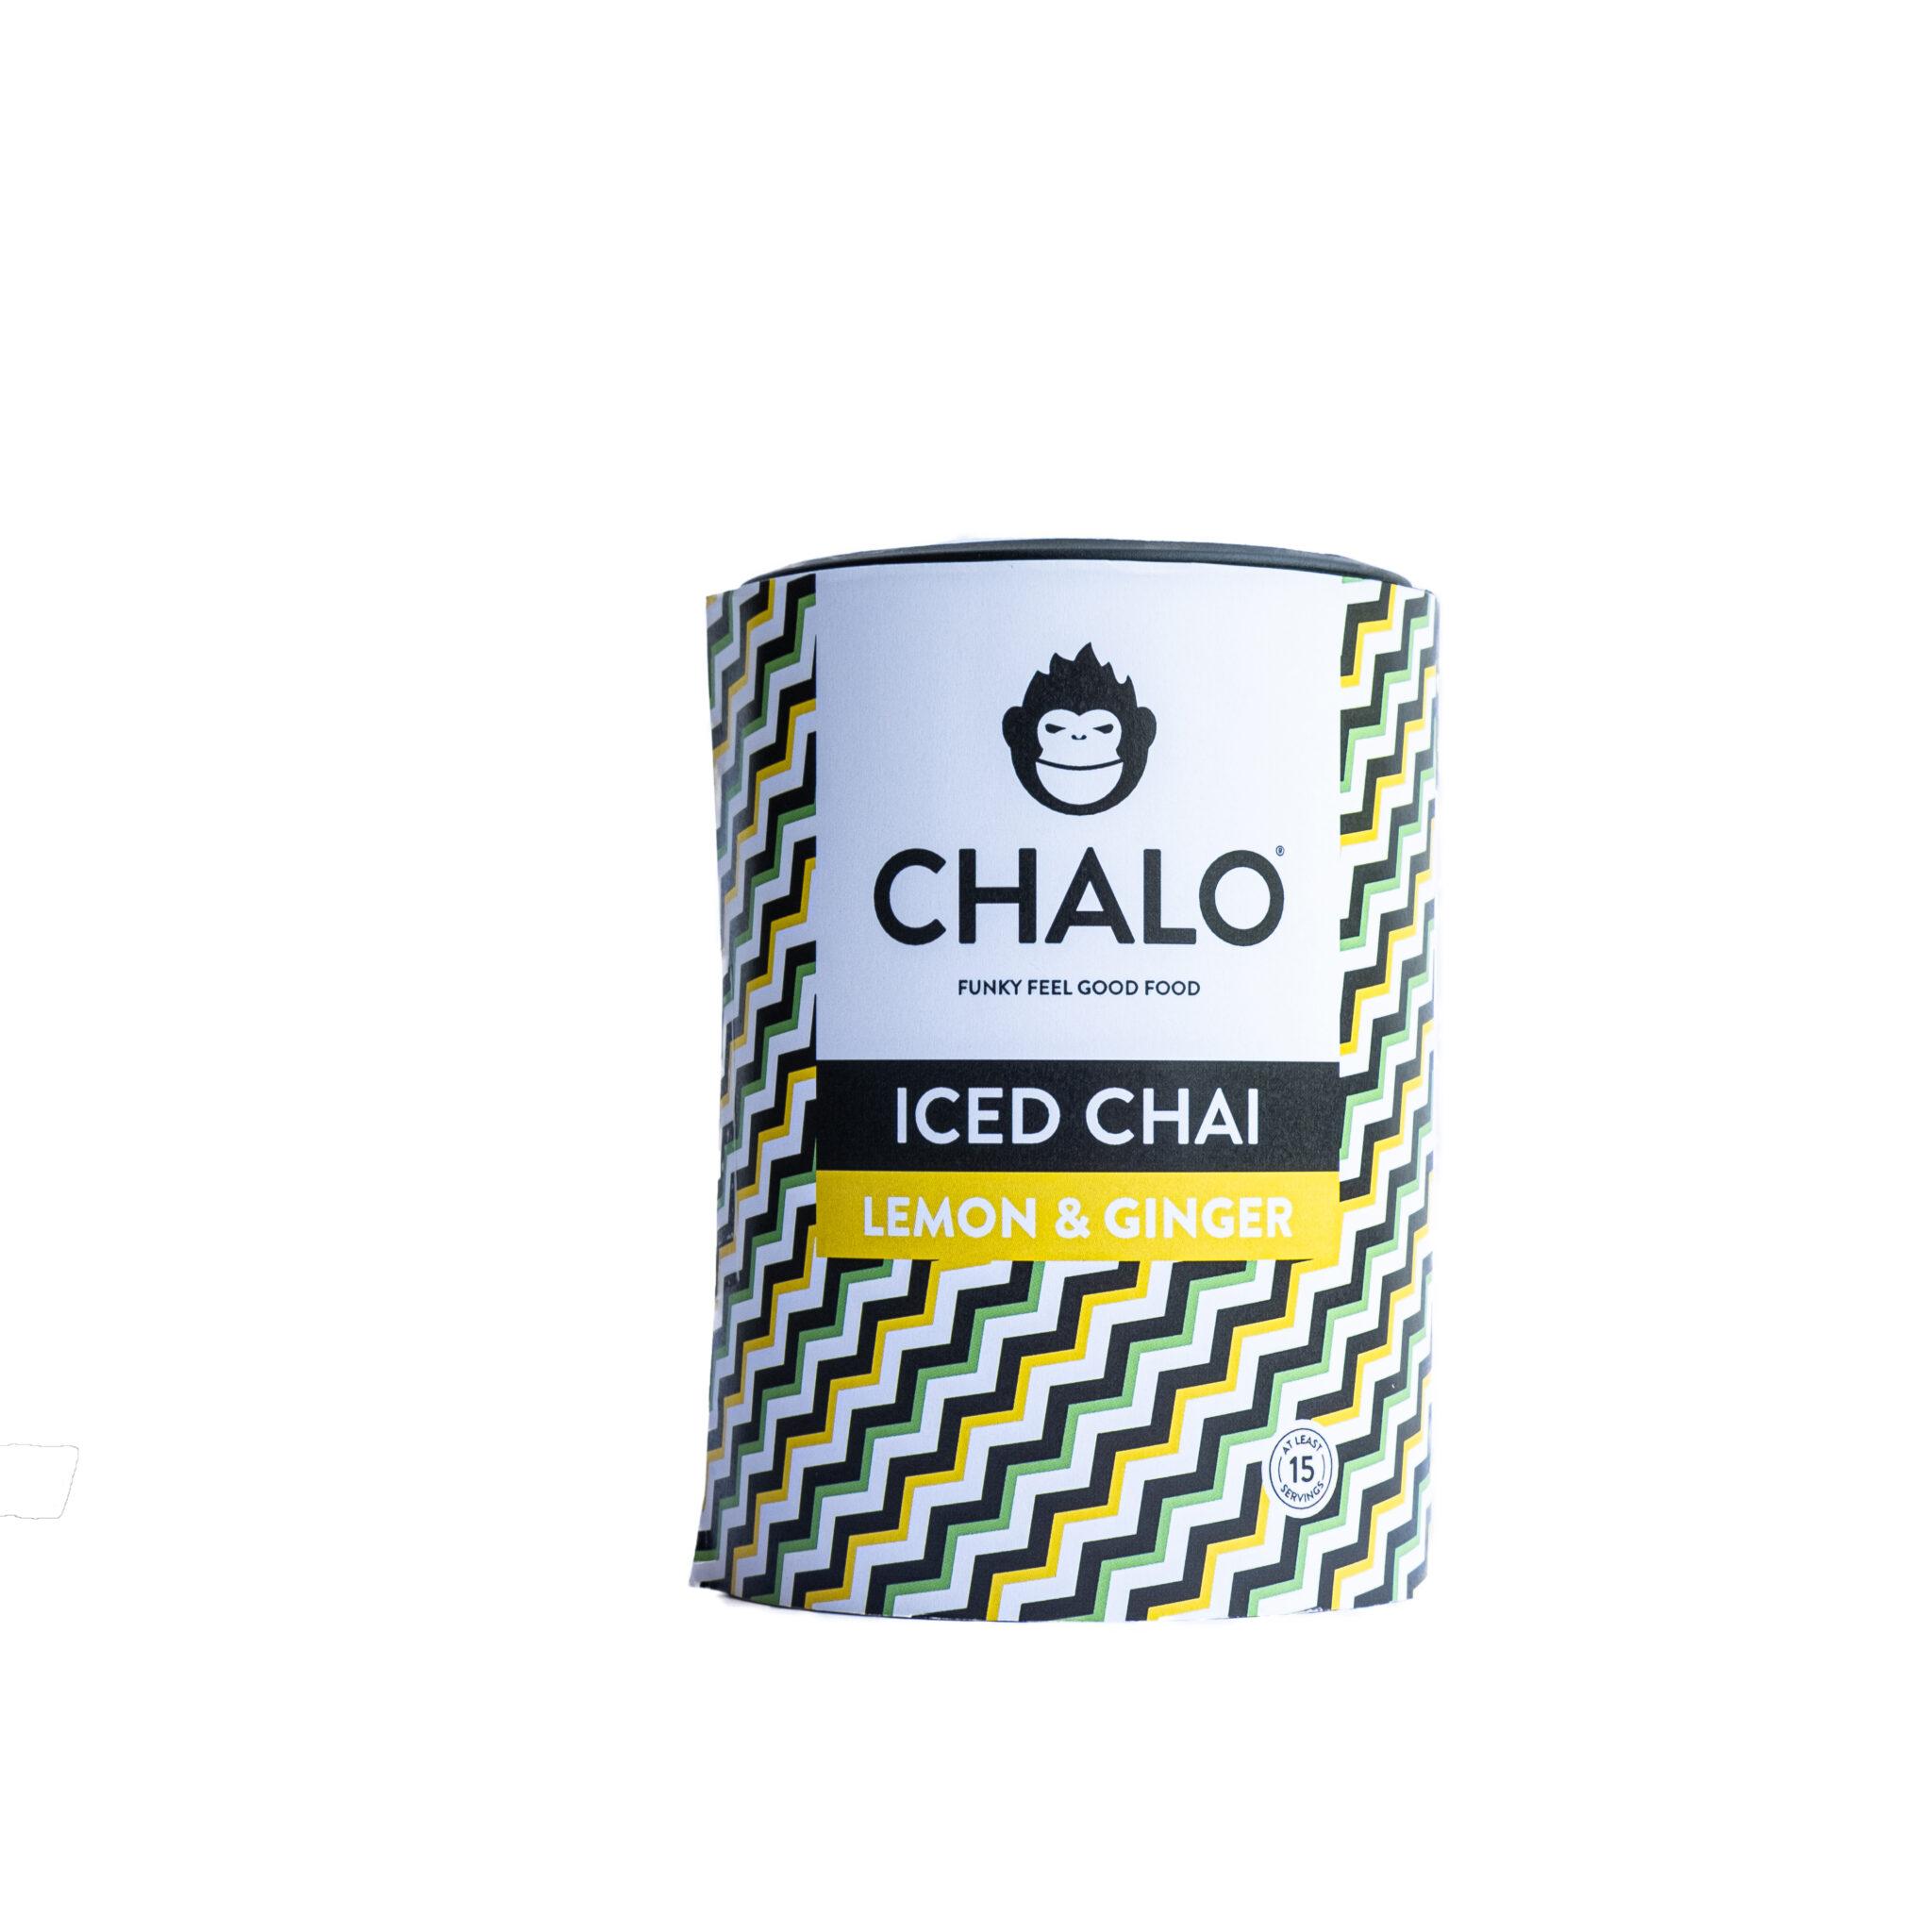 CHALO Lemon & Ginger Iced Chai